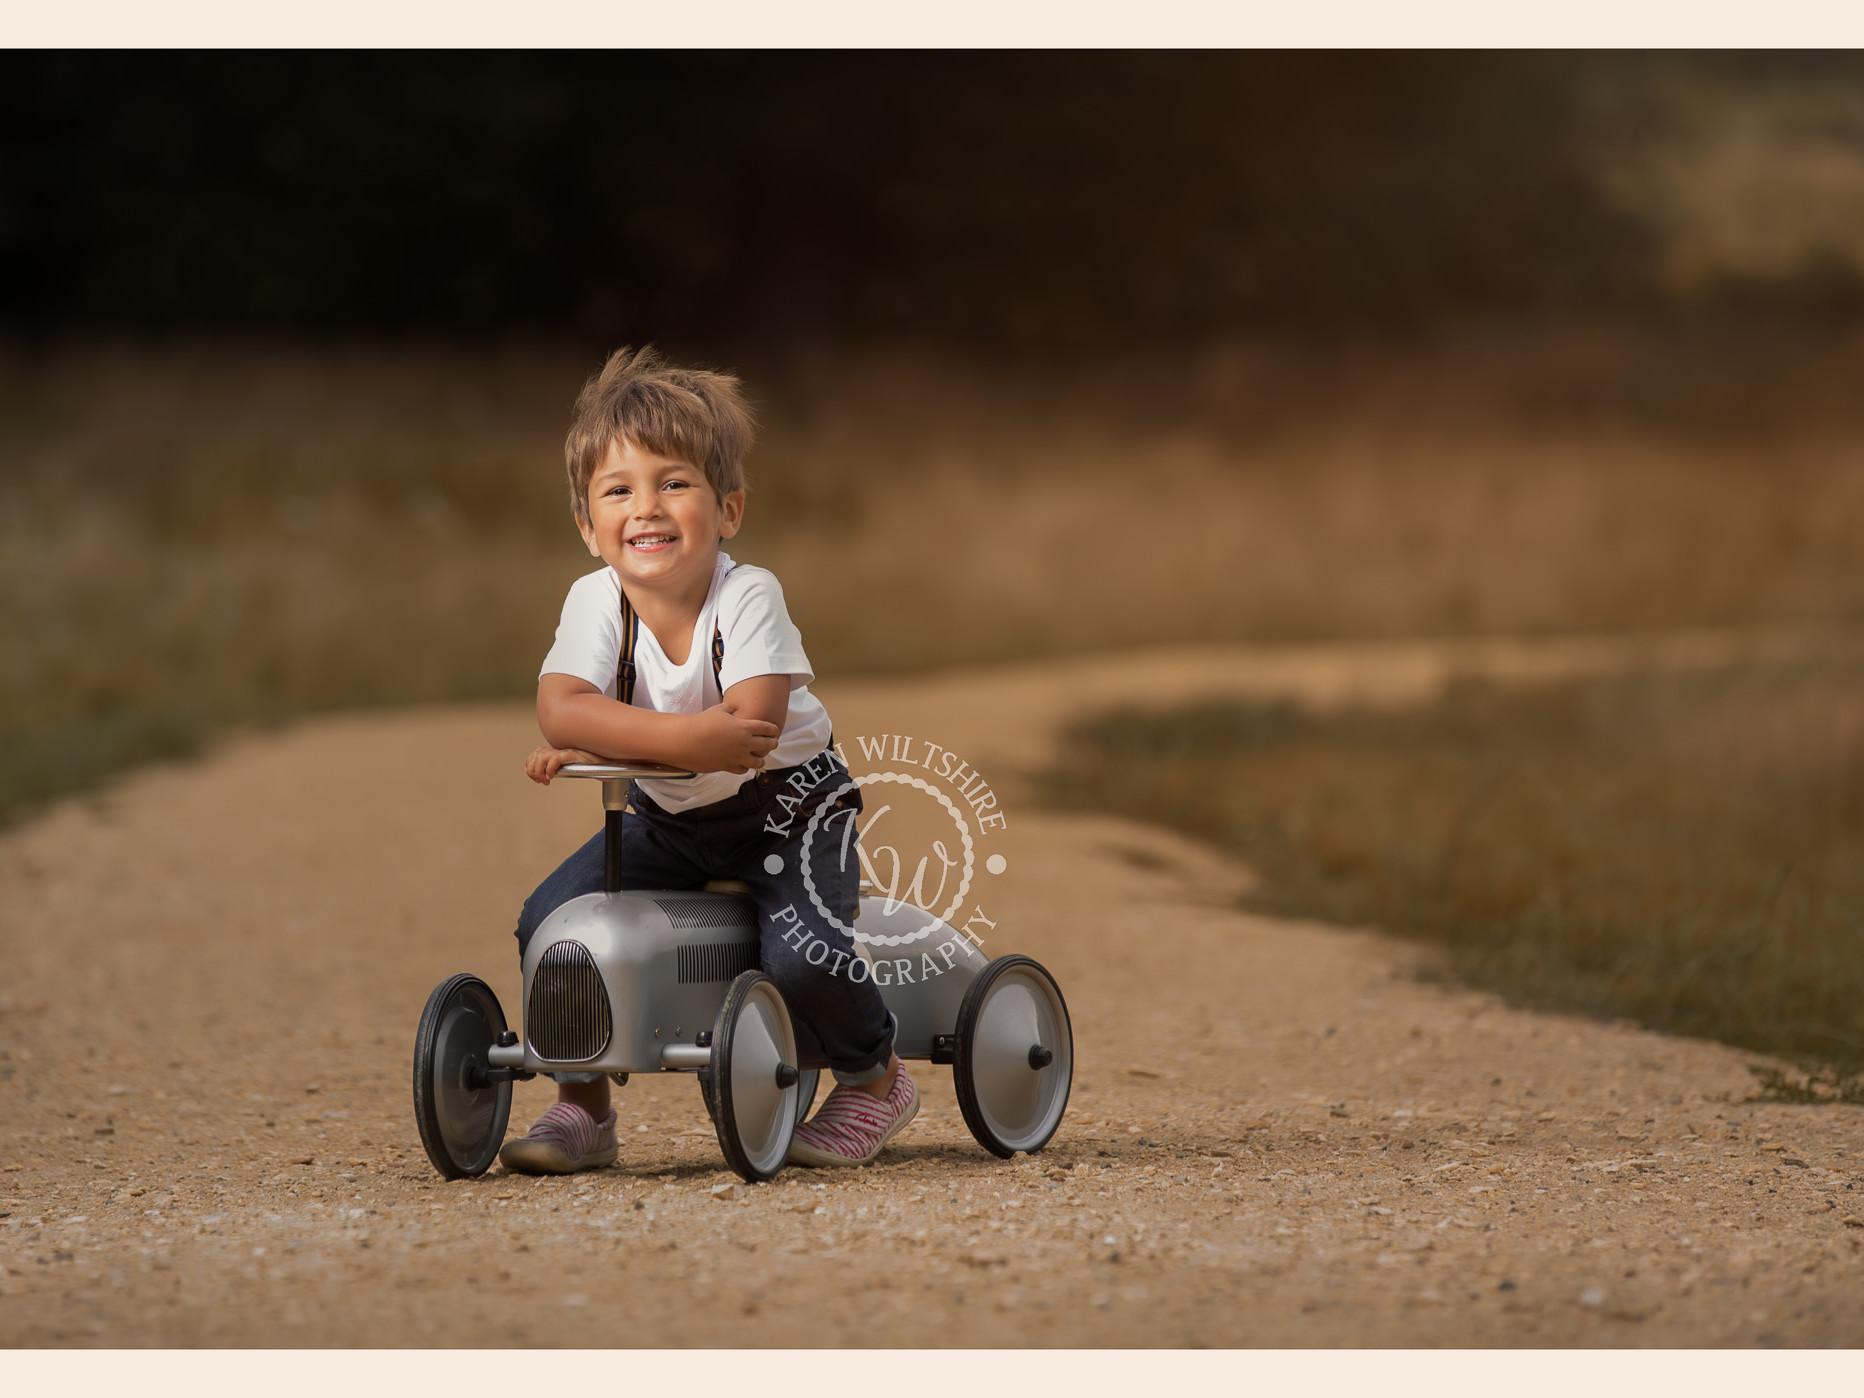 Kids photoshoot Dorset